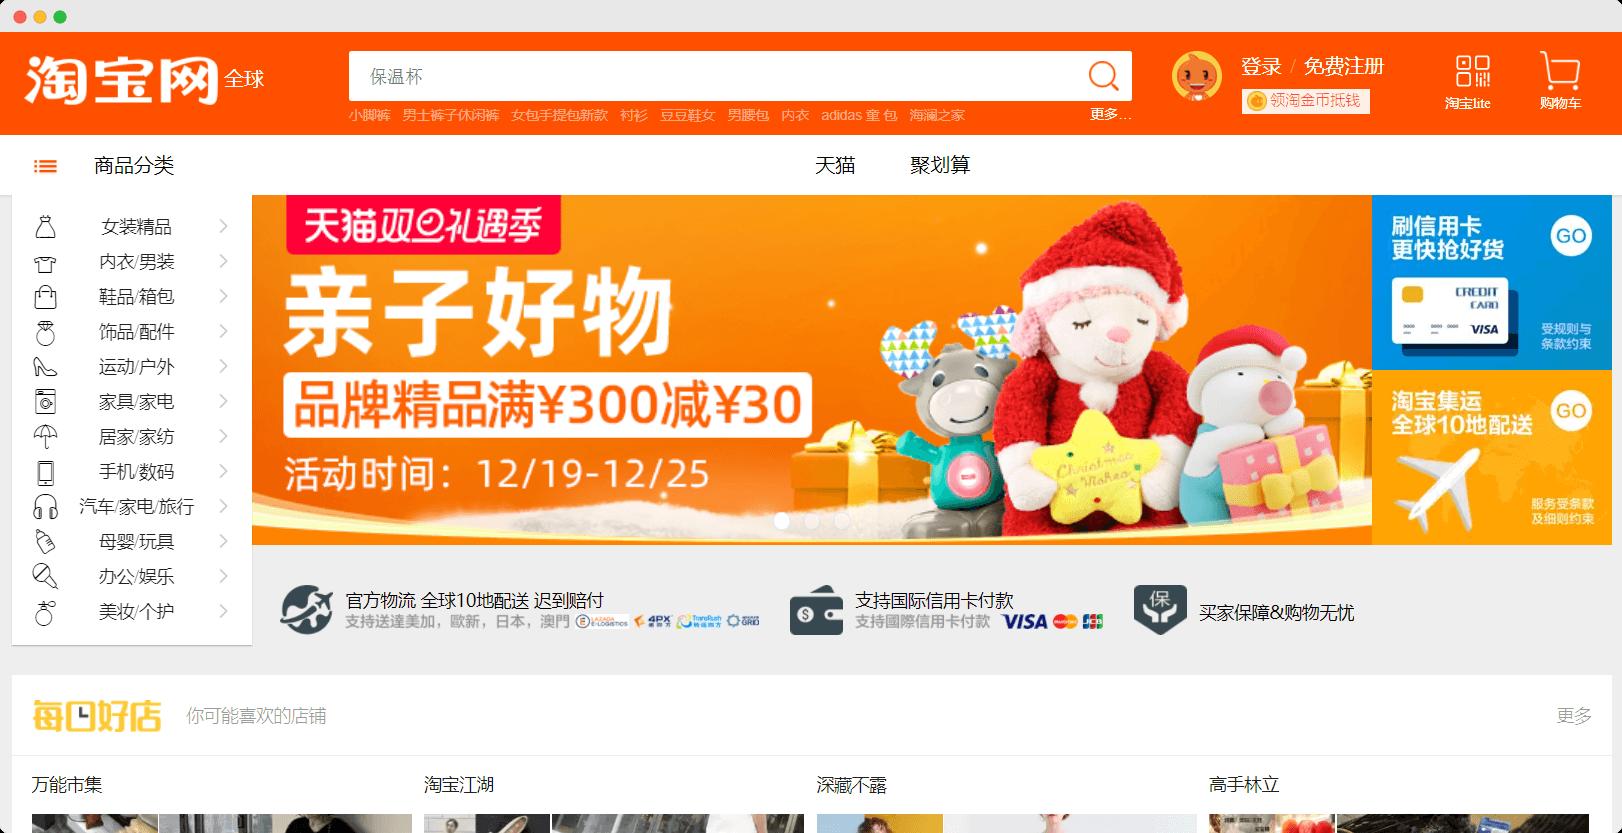 Figure 4 Taobao